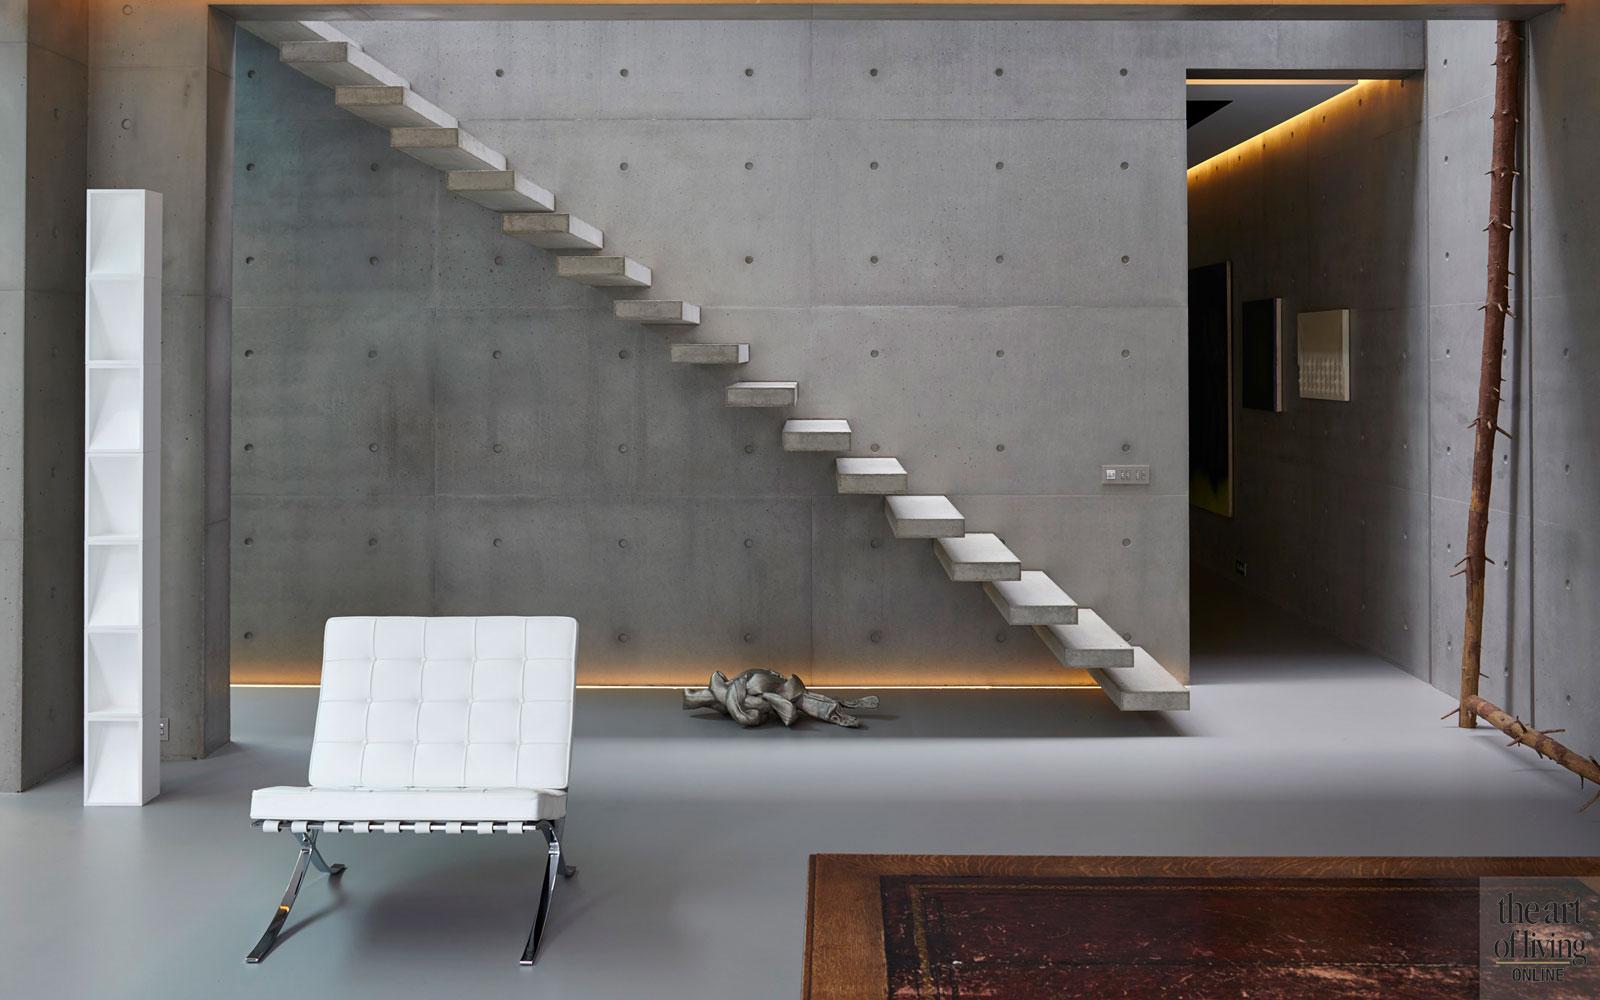 Kelder, trap, beton, lichte ruimte, Volder Interieur, Marcel Wolterinck, oud ontmoet nieuw, VVR Architecten